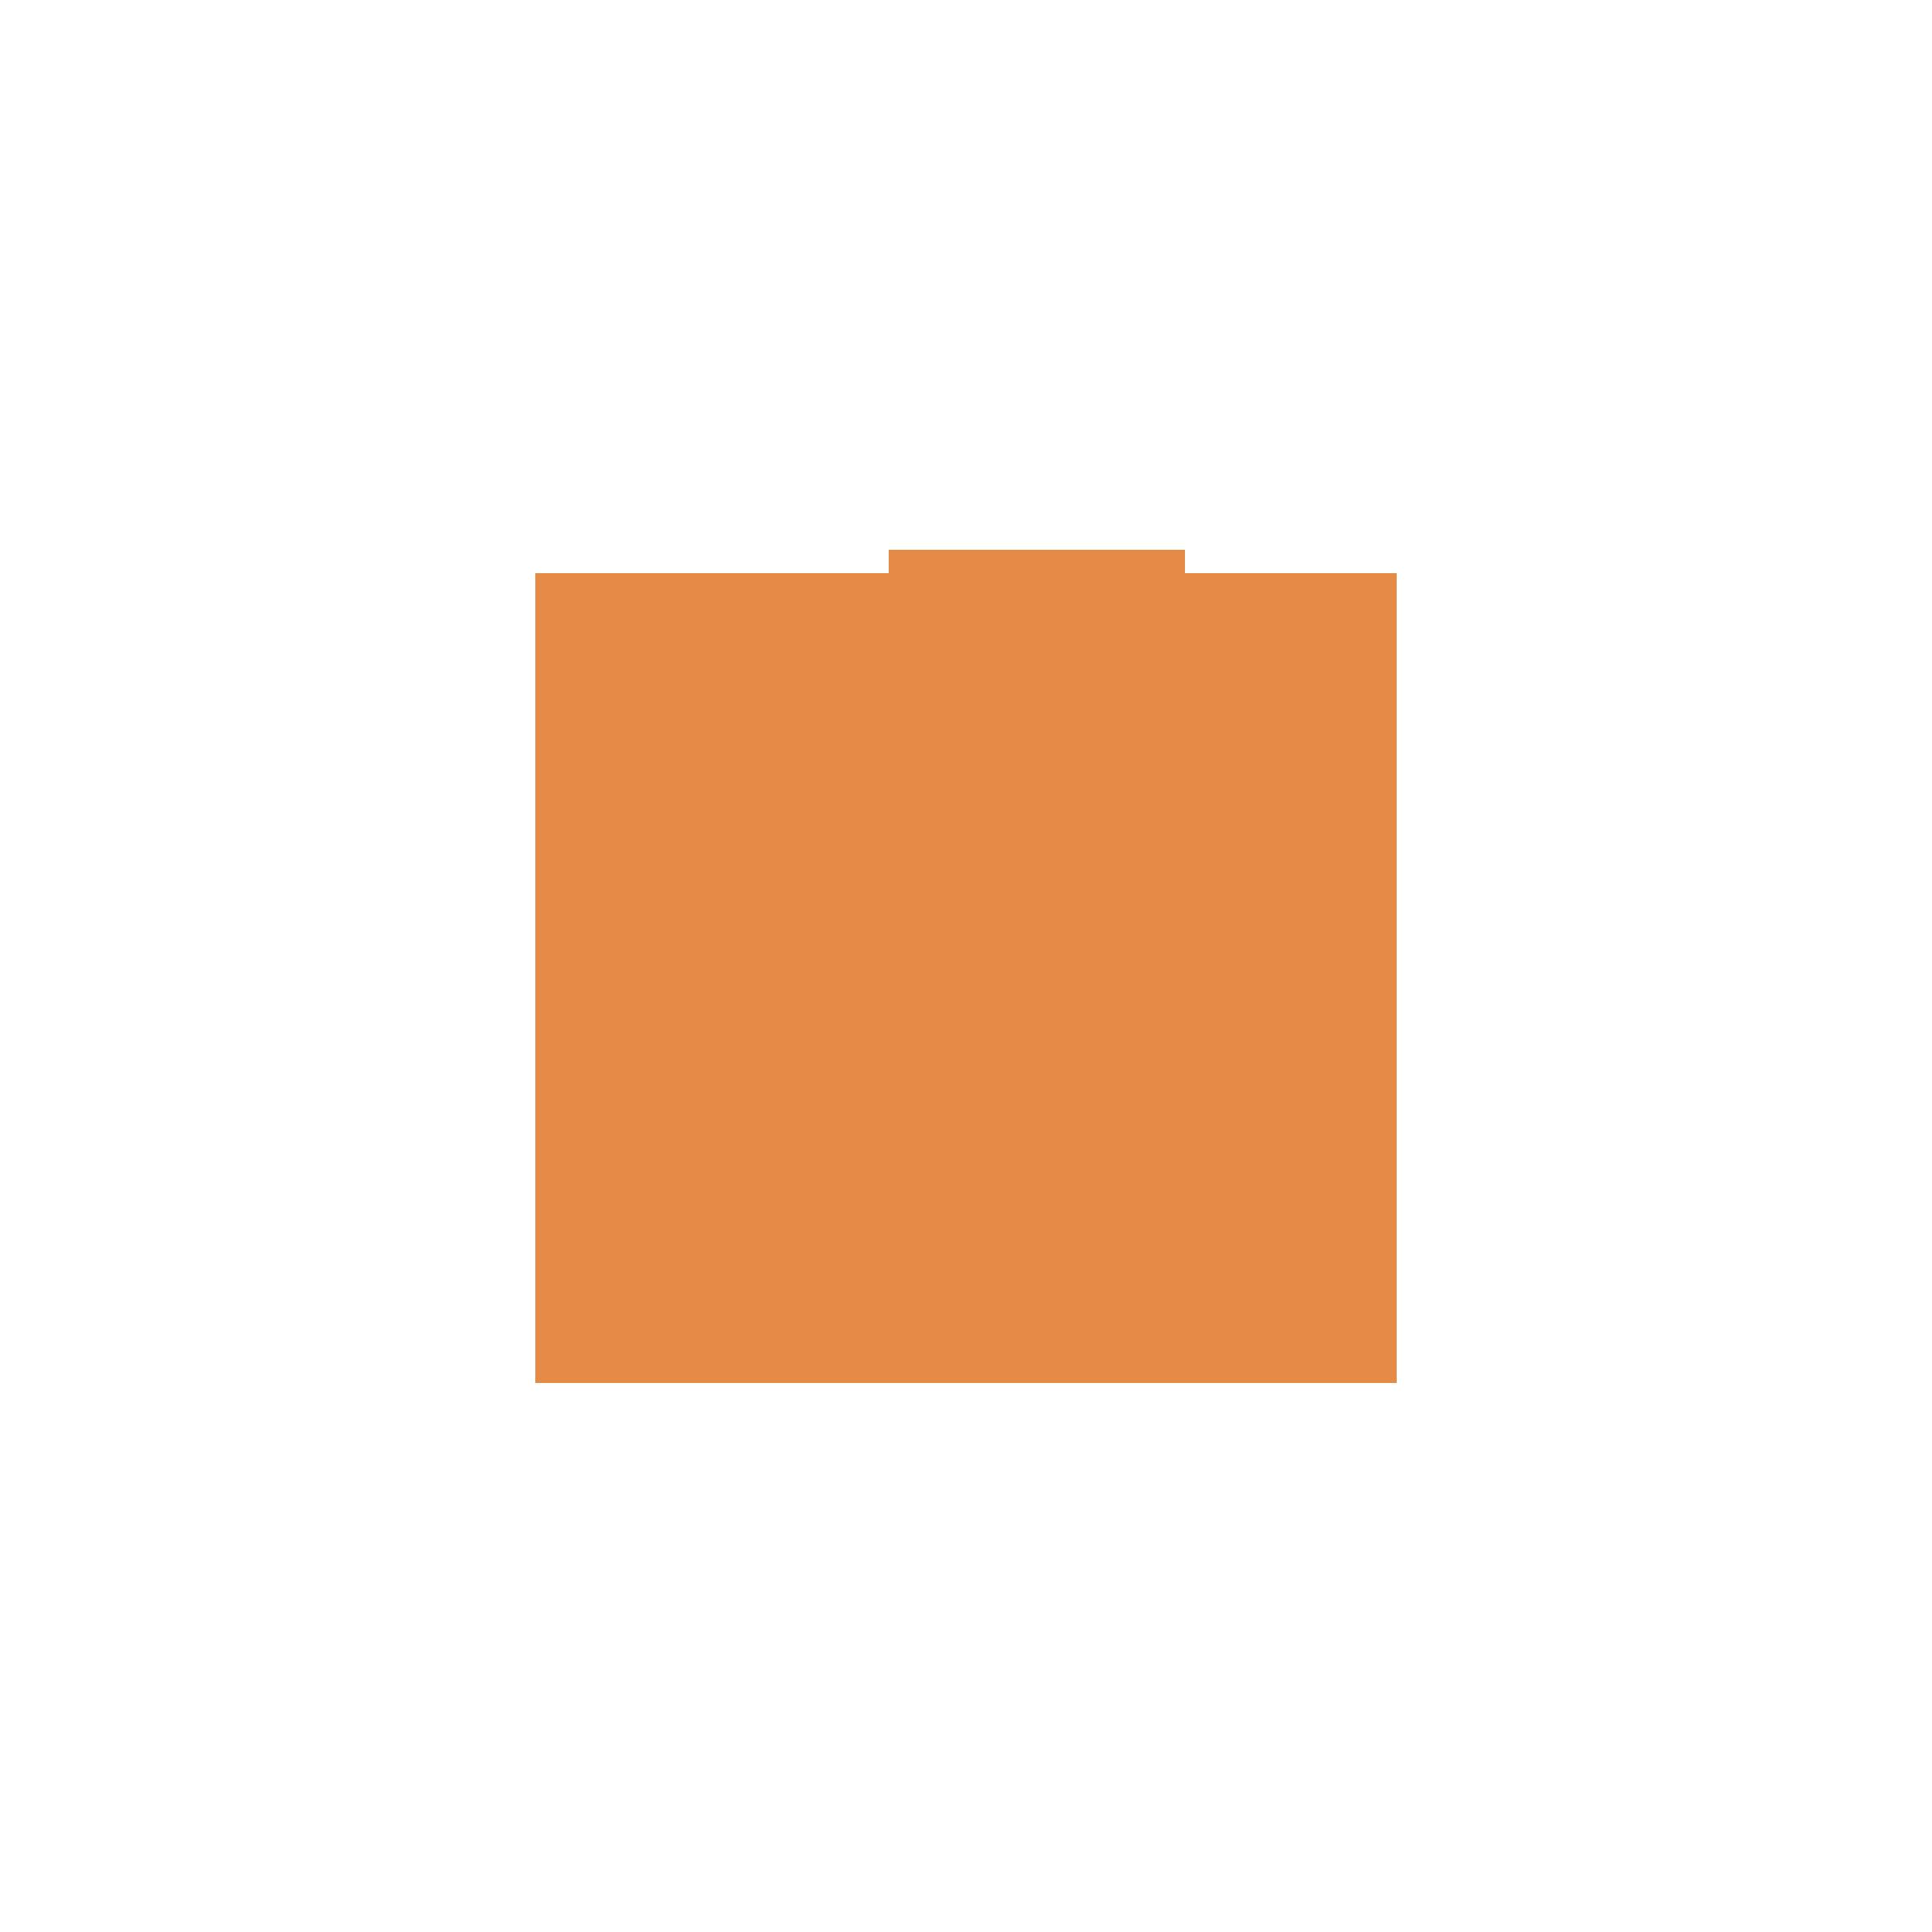 email icon for hello@theaom.com.au